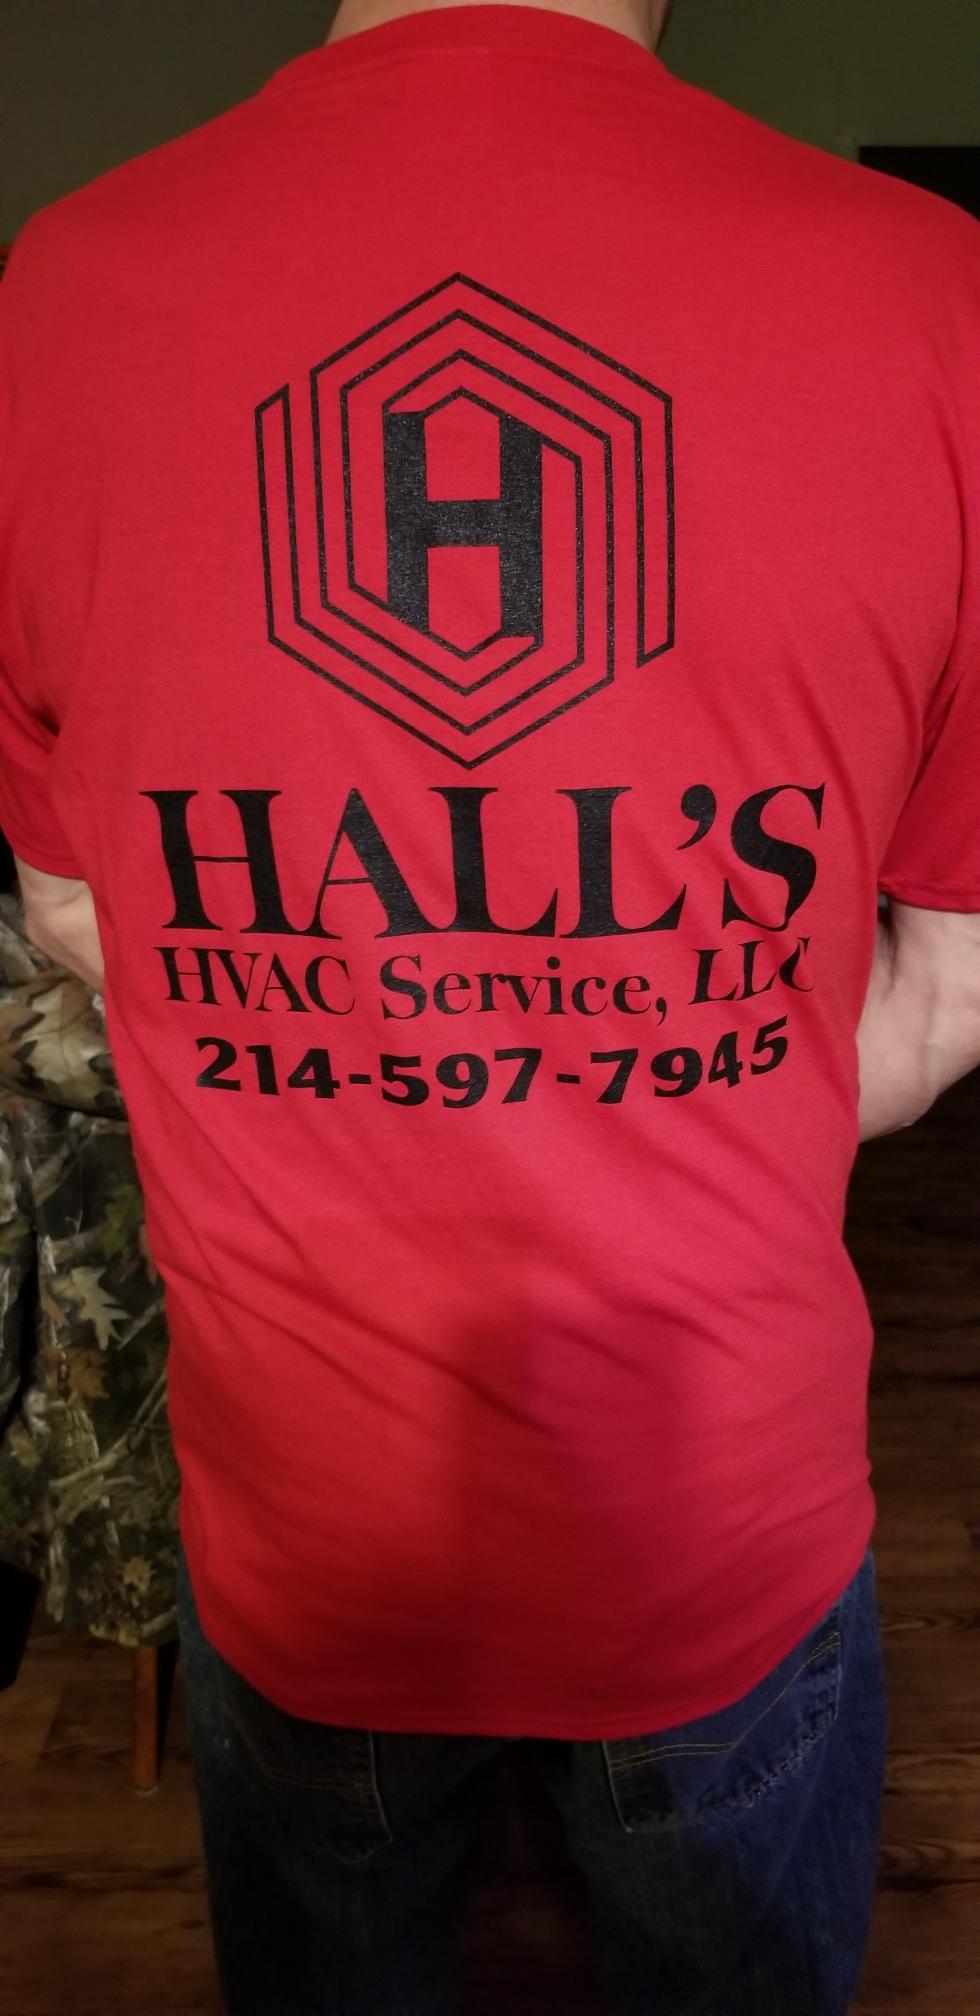 Hall's HVAC Service LLC image 5